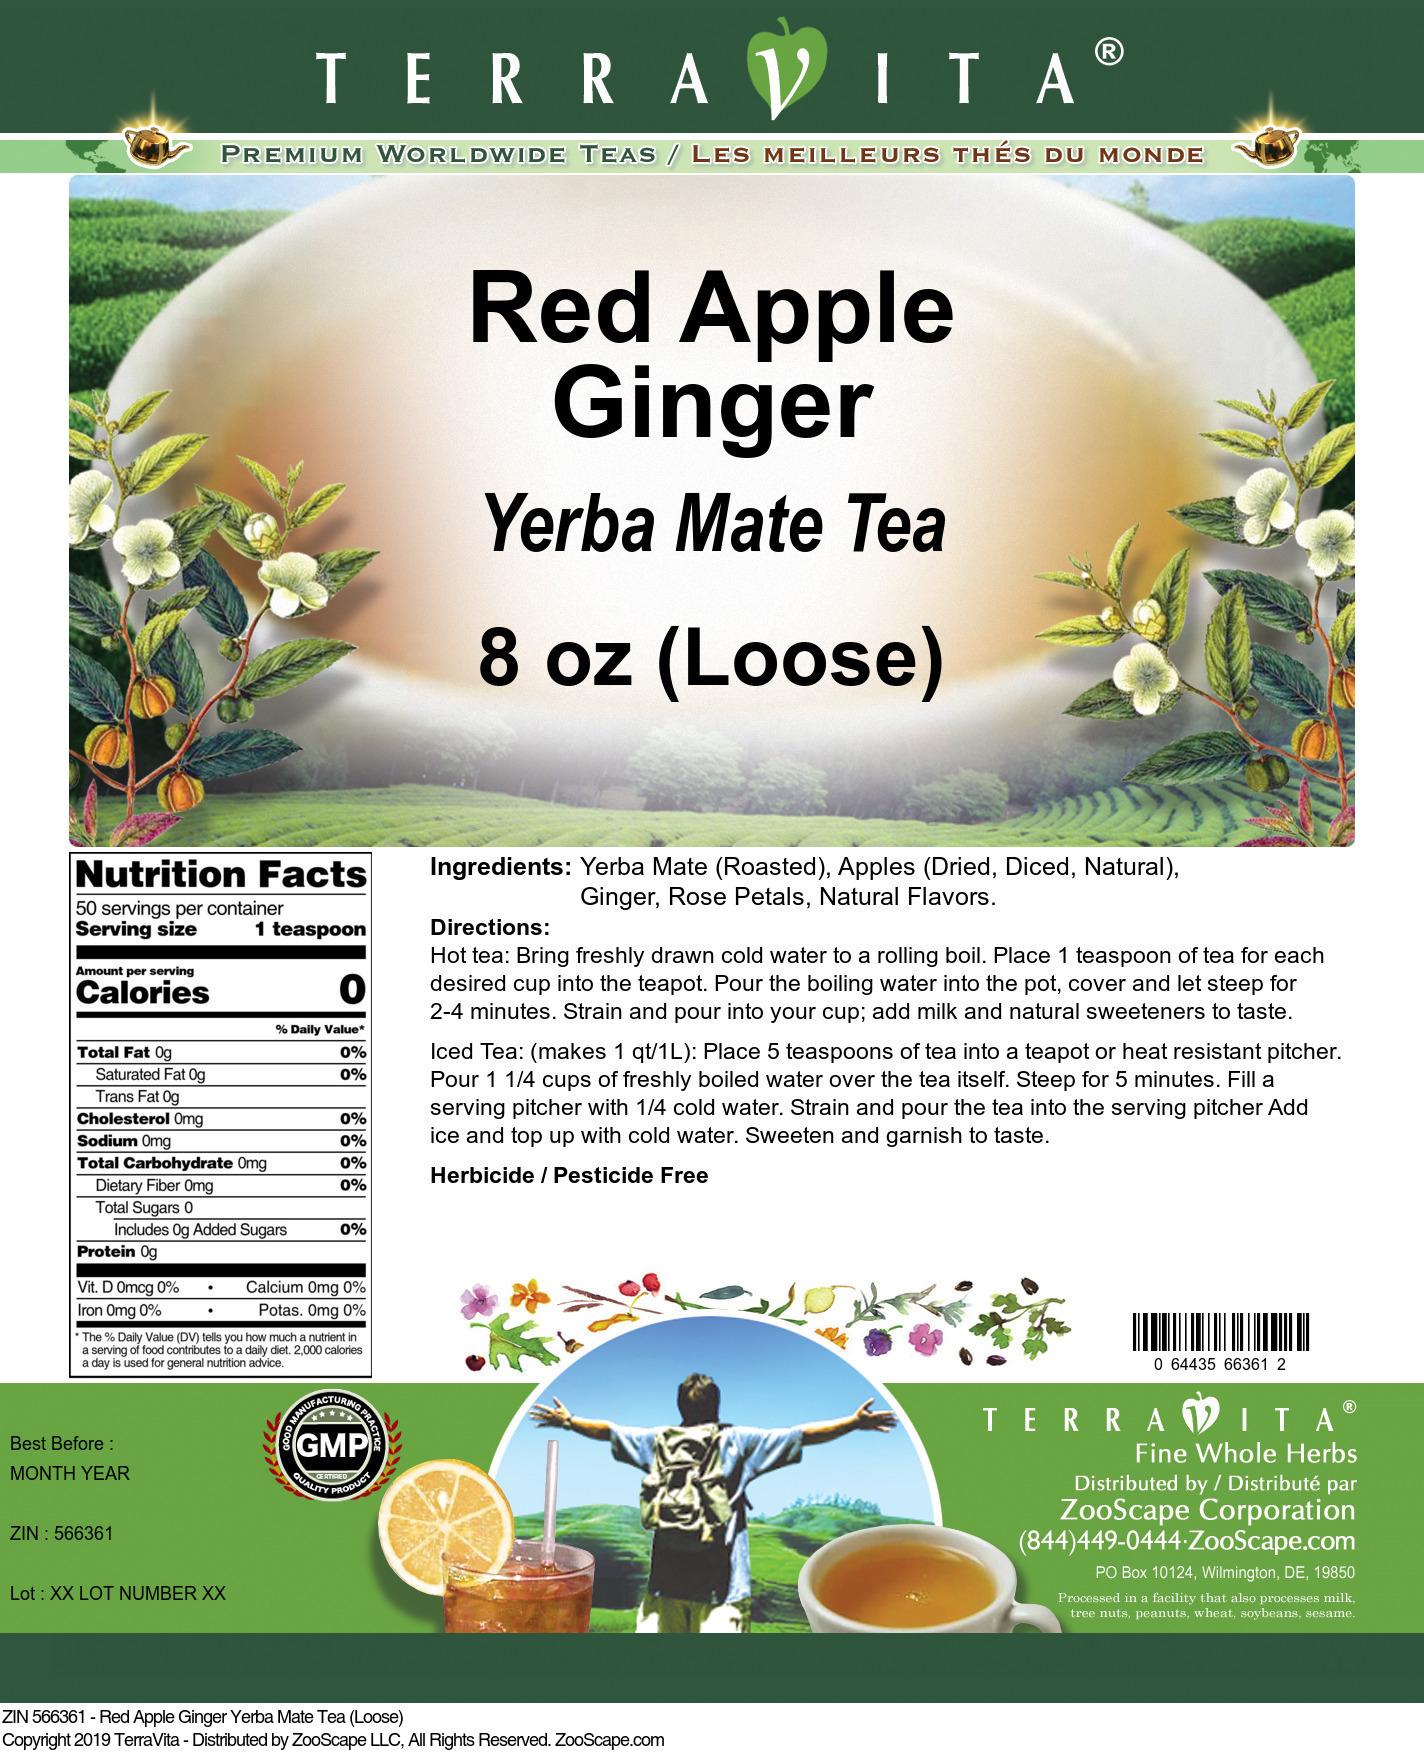 Red Apple Ginger Yerba Mate